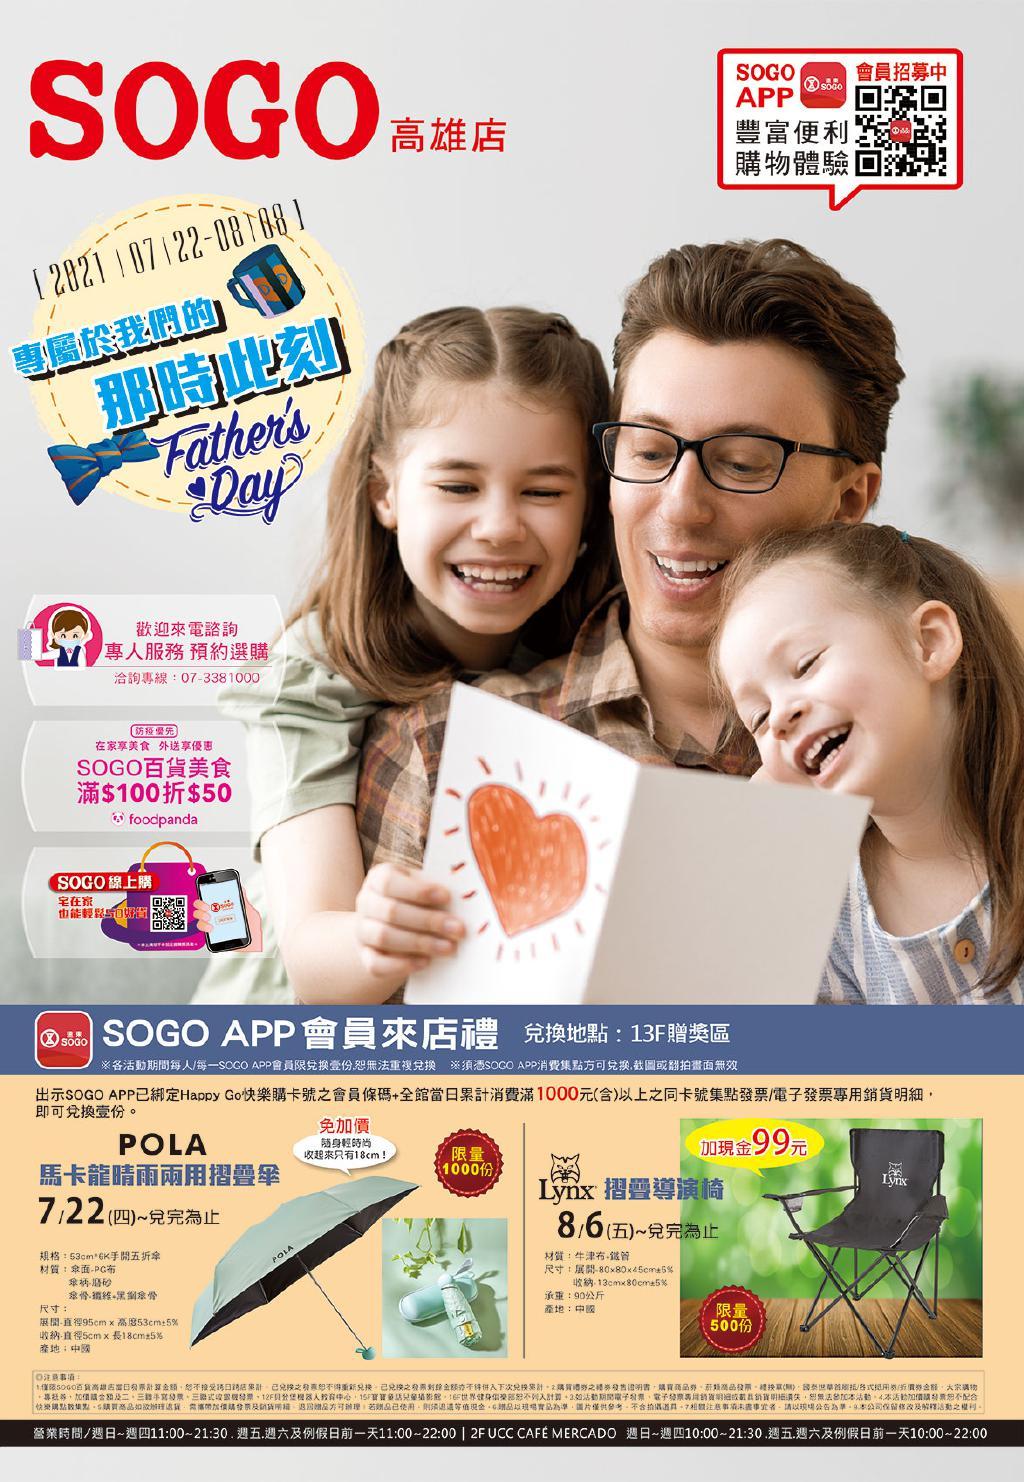 SOGO高雄店DM》「專屬於我們的 那時此刻 Father's Day」【2021/8/8止】